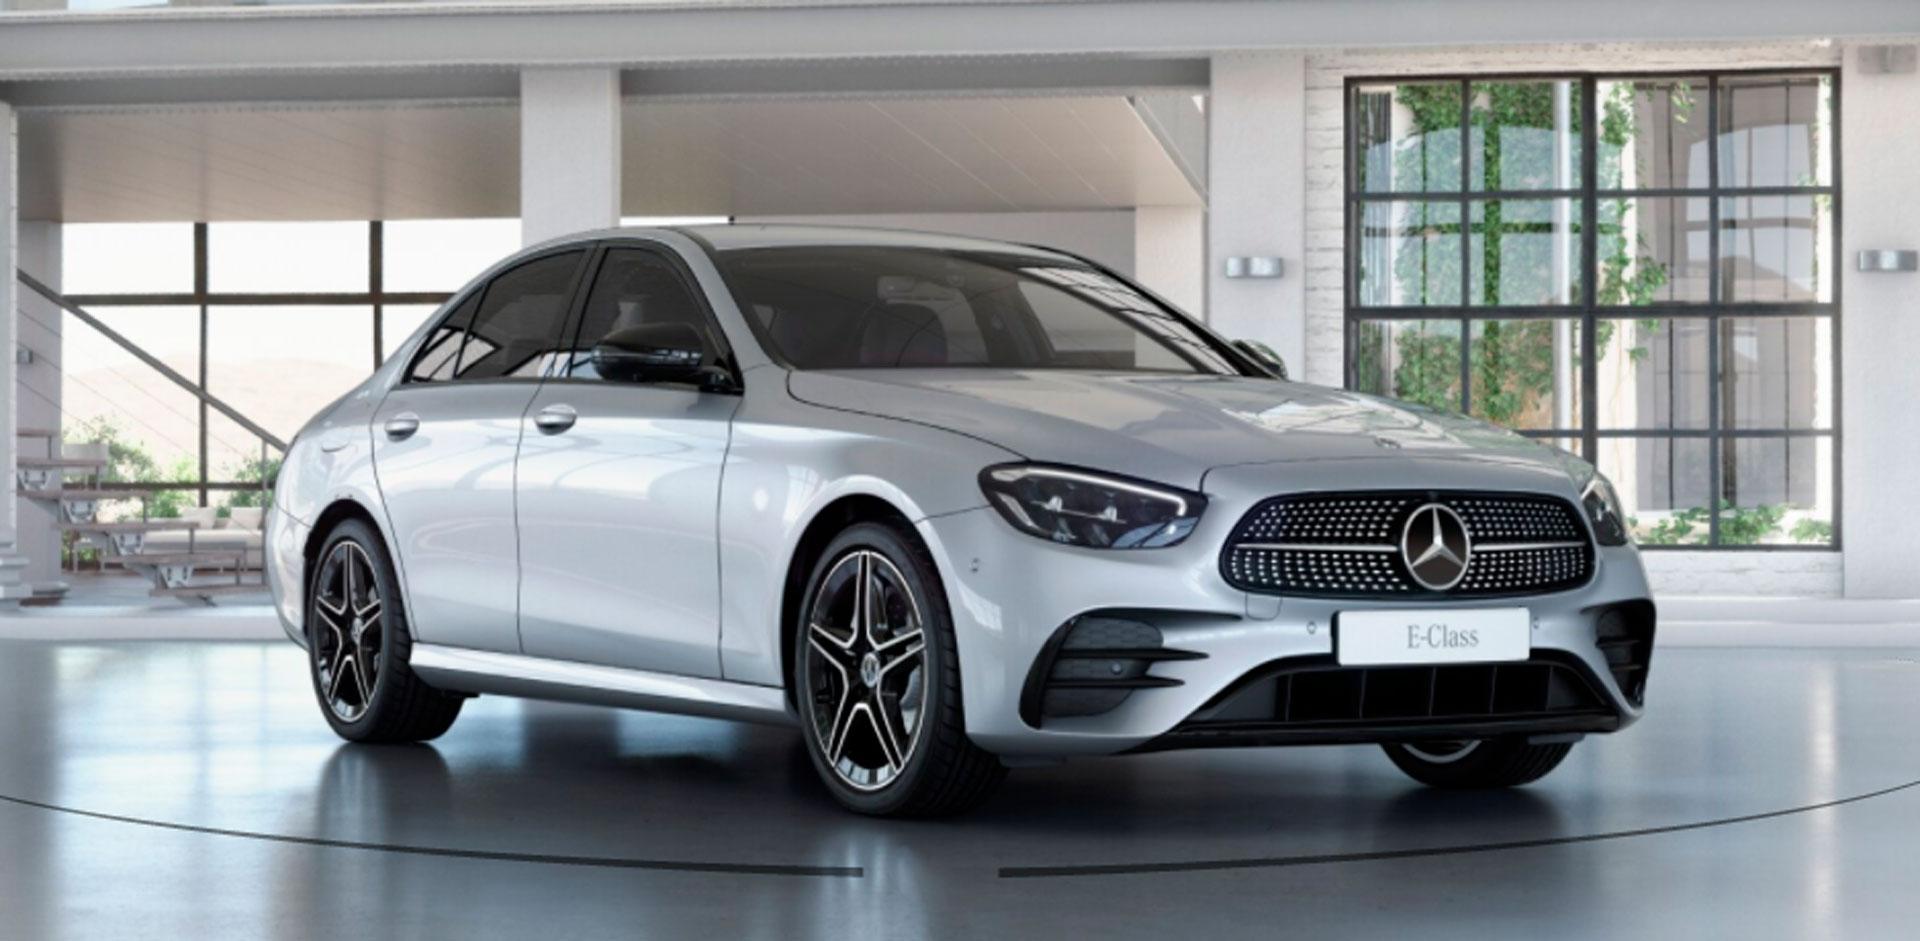 Mercedes-Benz E-Class Limousine 0152601369